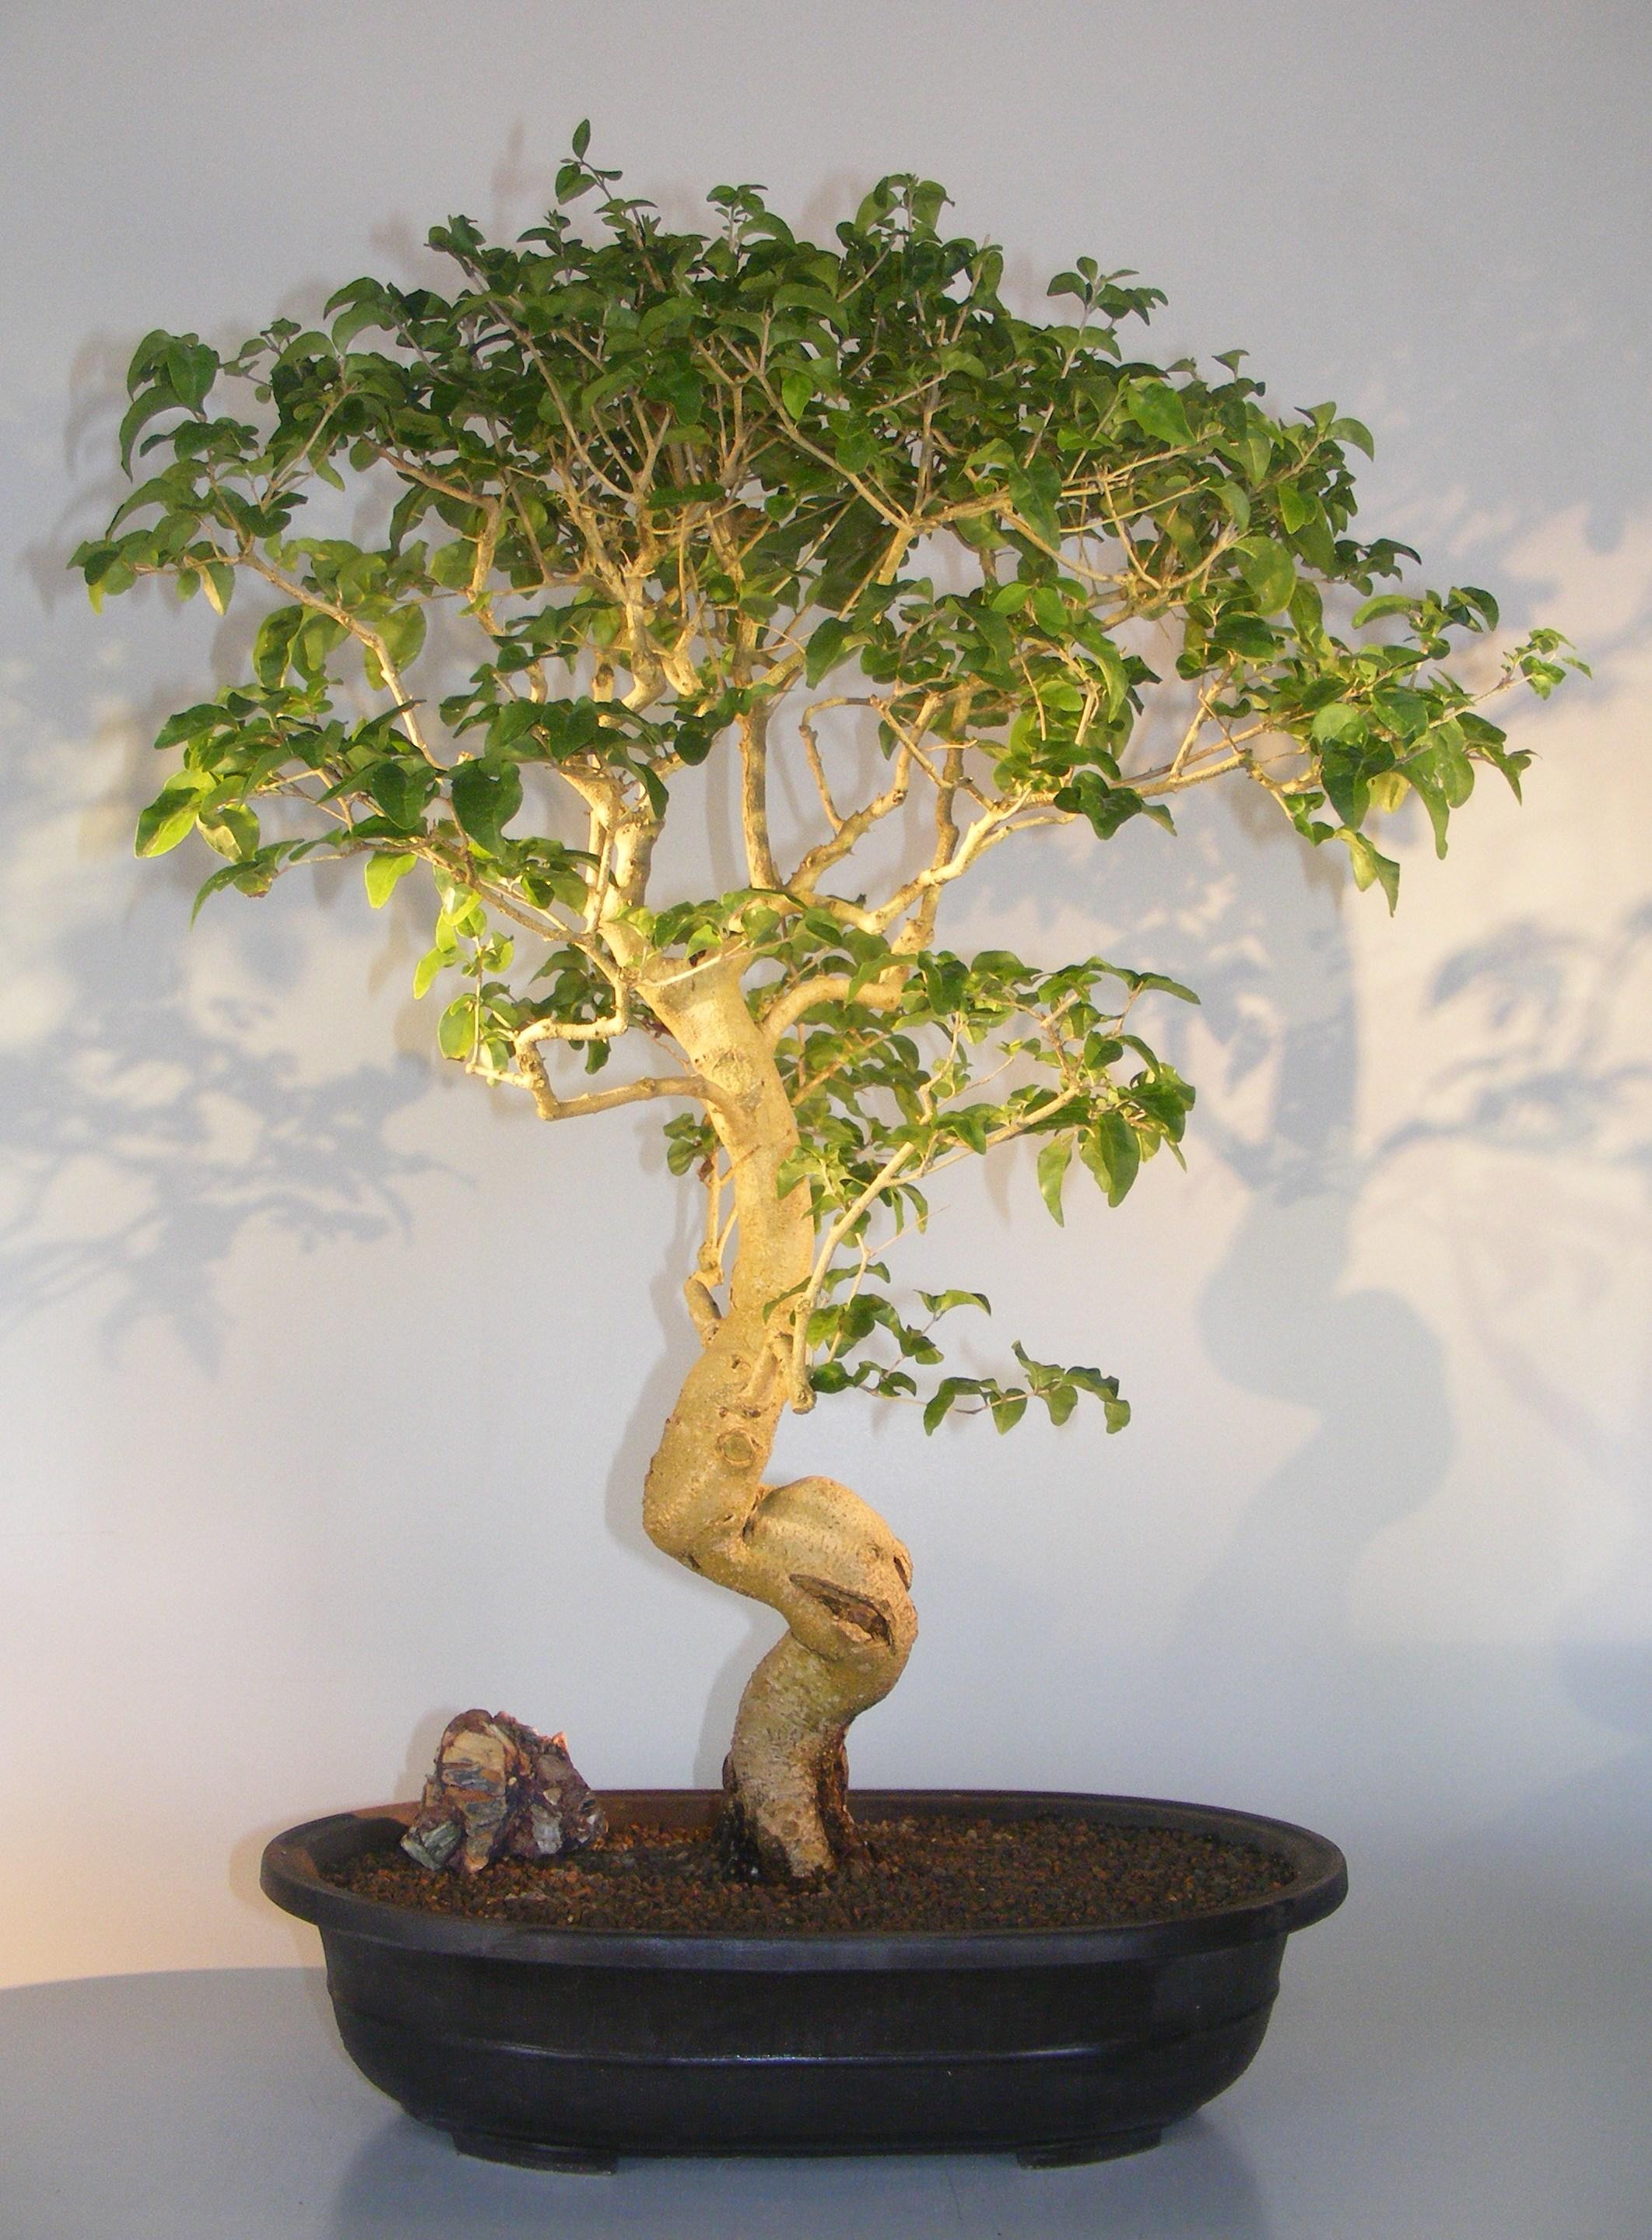 Flowering Ligustrum Bonsai TreeCurved Trunk & Tiered Branching Style(ligustrum lucidum) Image